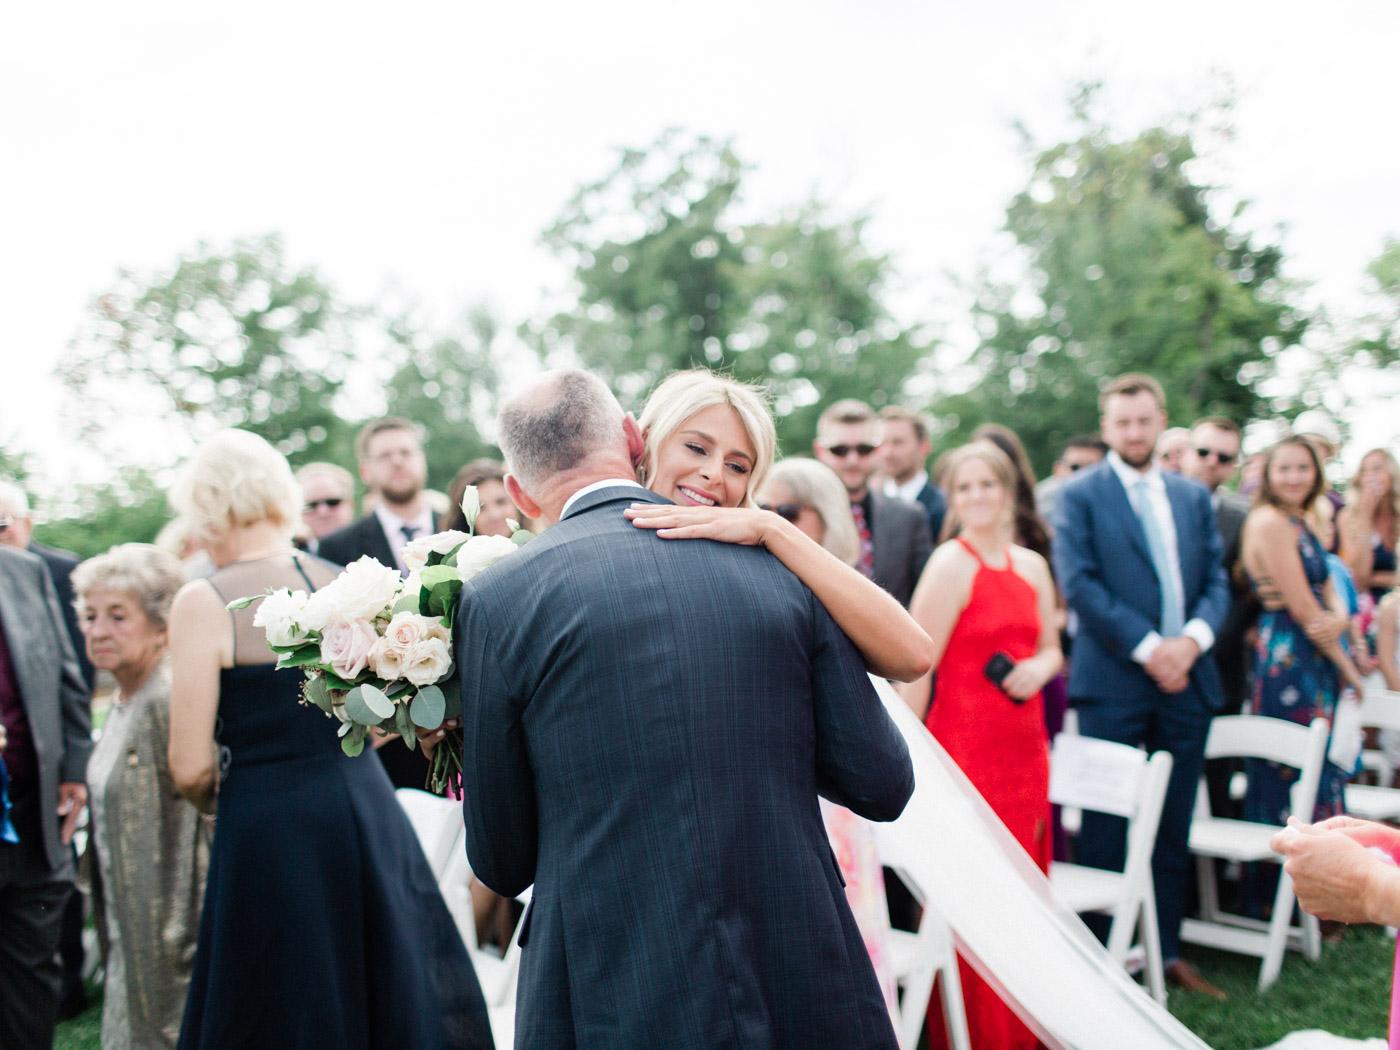 Toronto-Muskoka-wedding-photographer-summery-fun-documentary-the-marriott-rosseau79.jpg